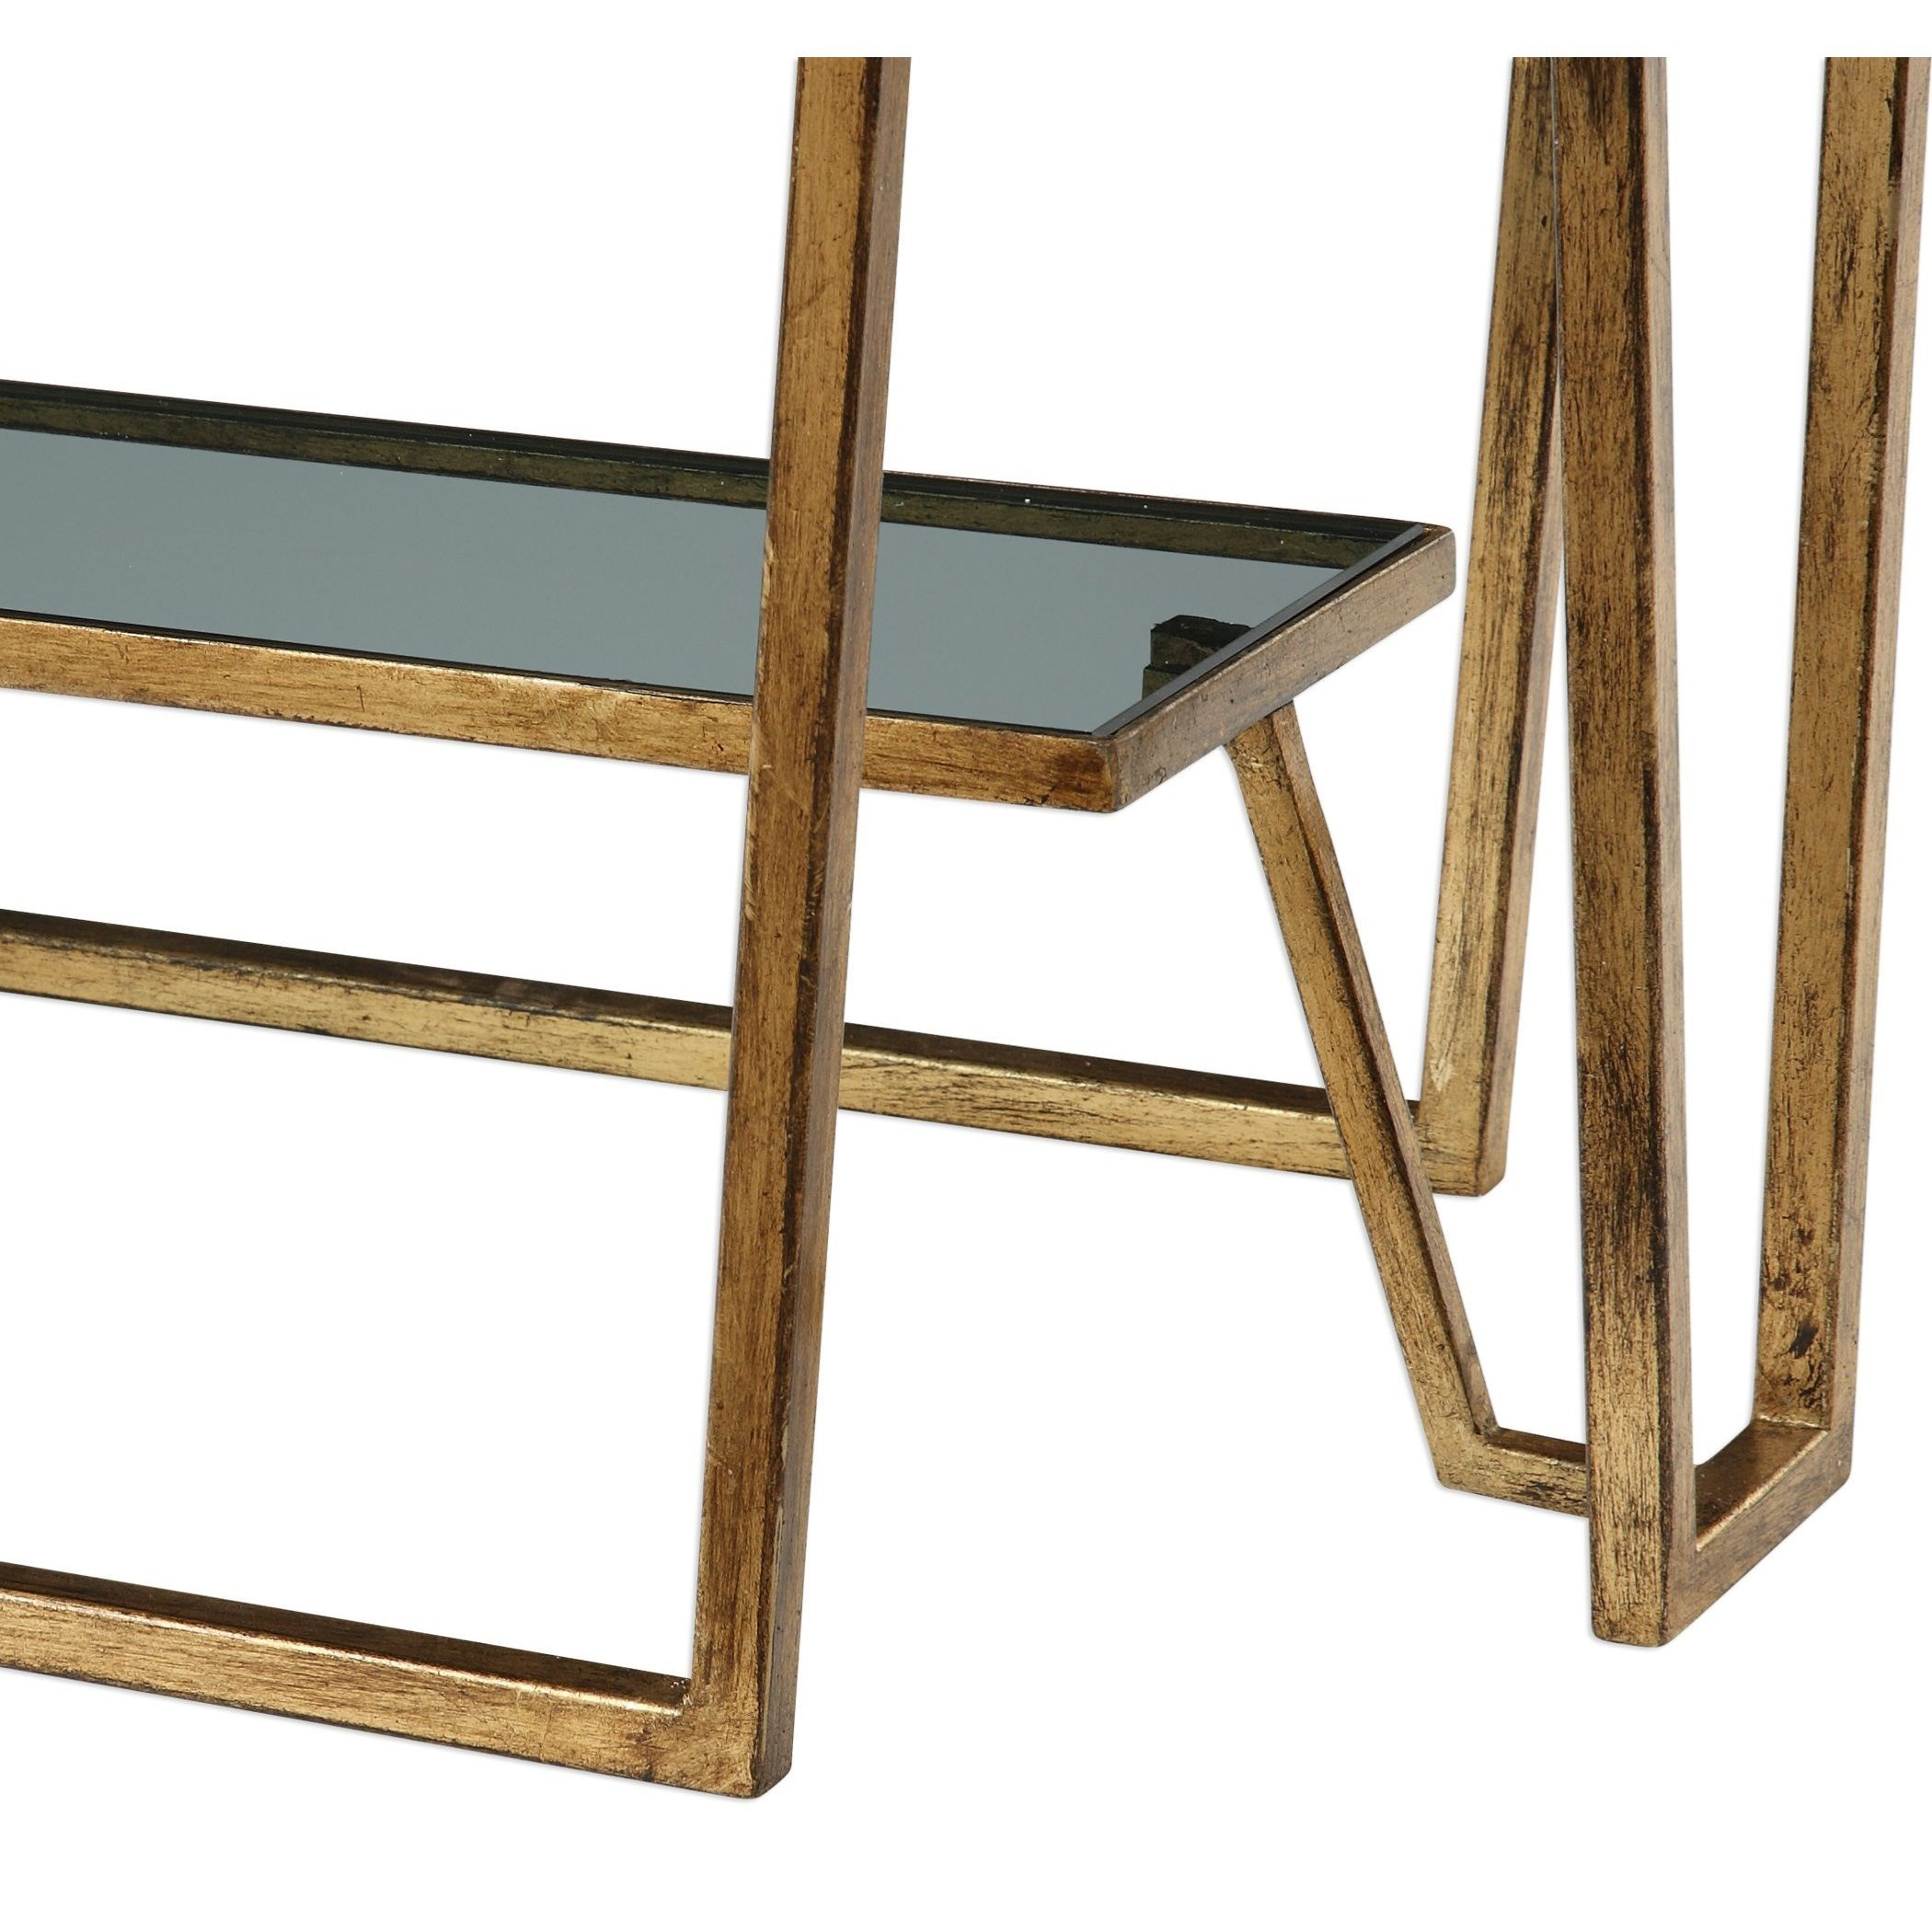 ... Uttermost Accent FurnitureAgnes Black Granite Console Table ...